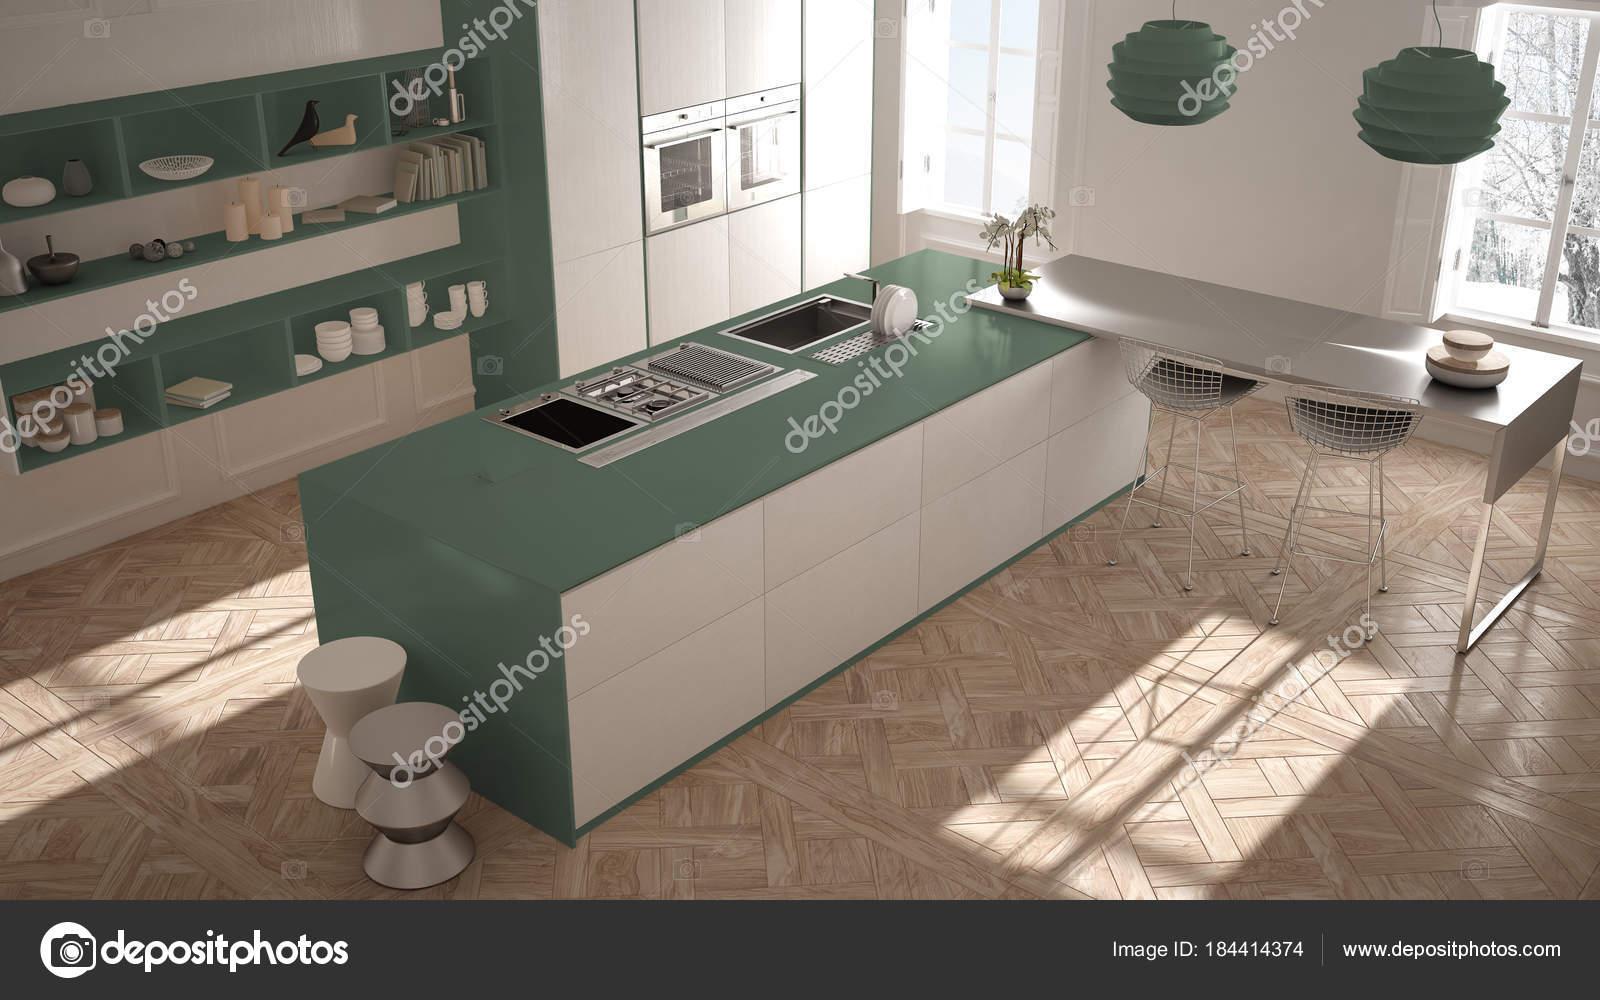 modern kitchen stools designs of small modular 现代厨房在古典内饰 海岛与凳子和二个大窗口 顶部看法 白色和绿色建筑